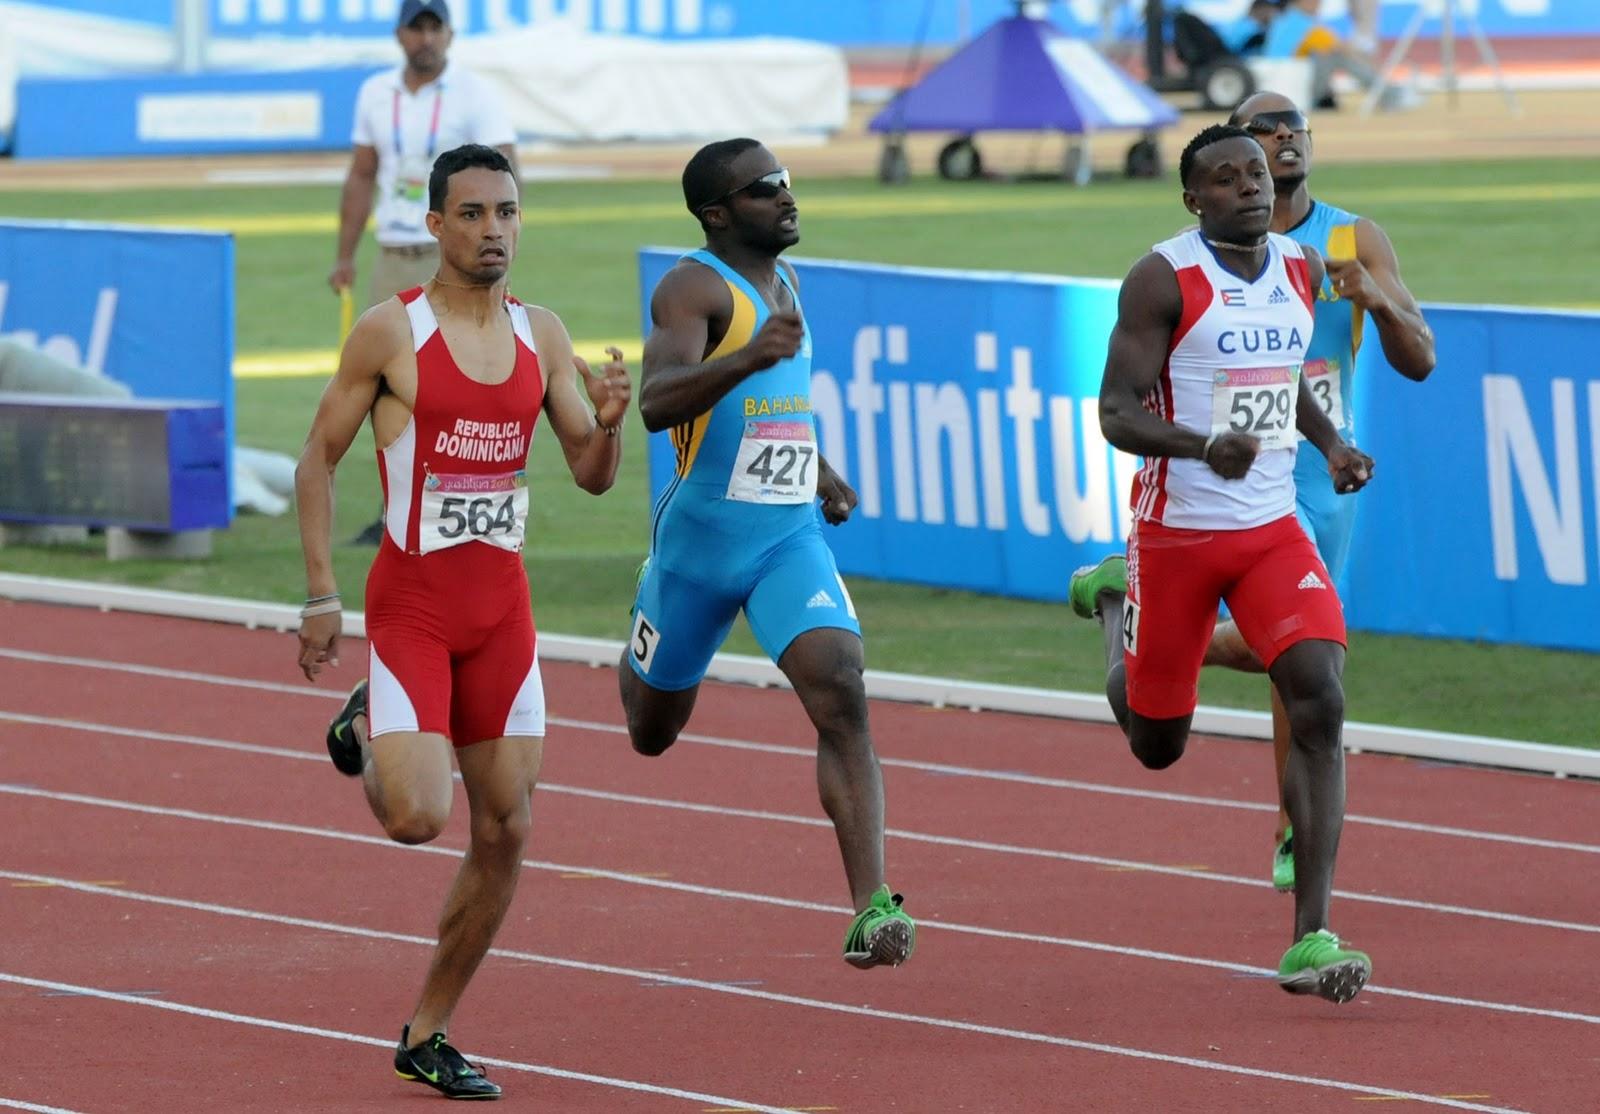 historia del atletismo en la republica dominicana: